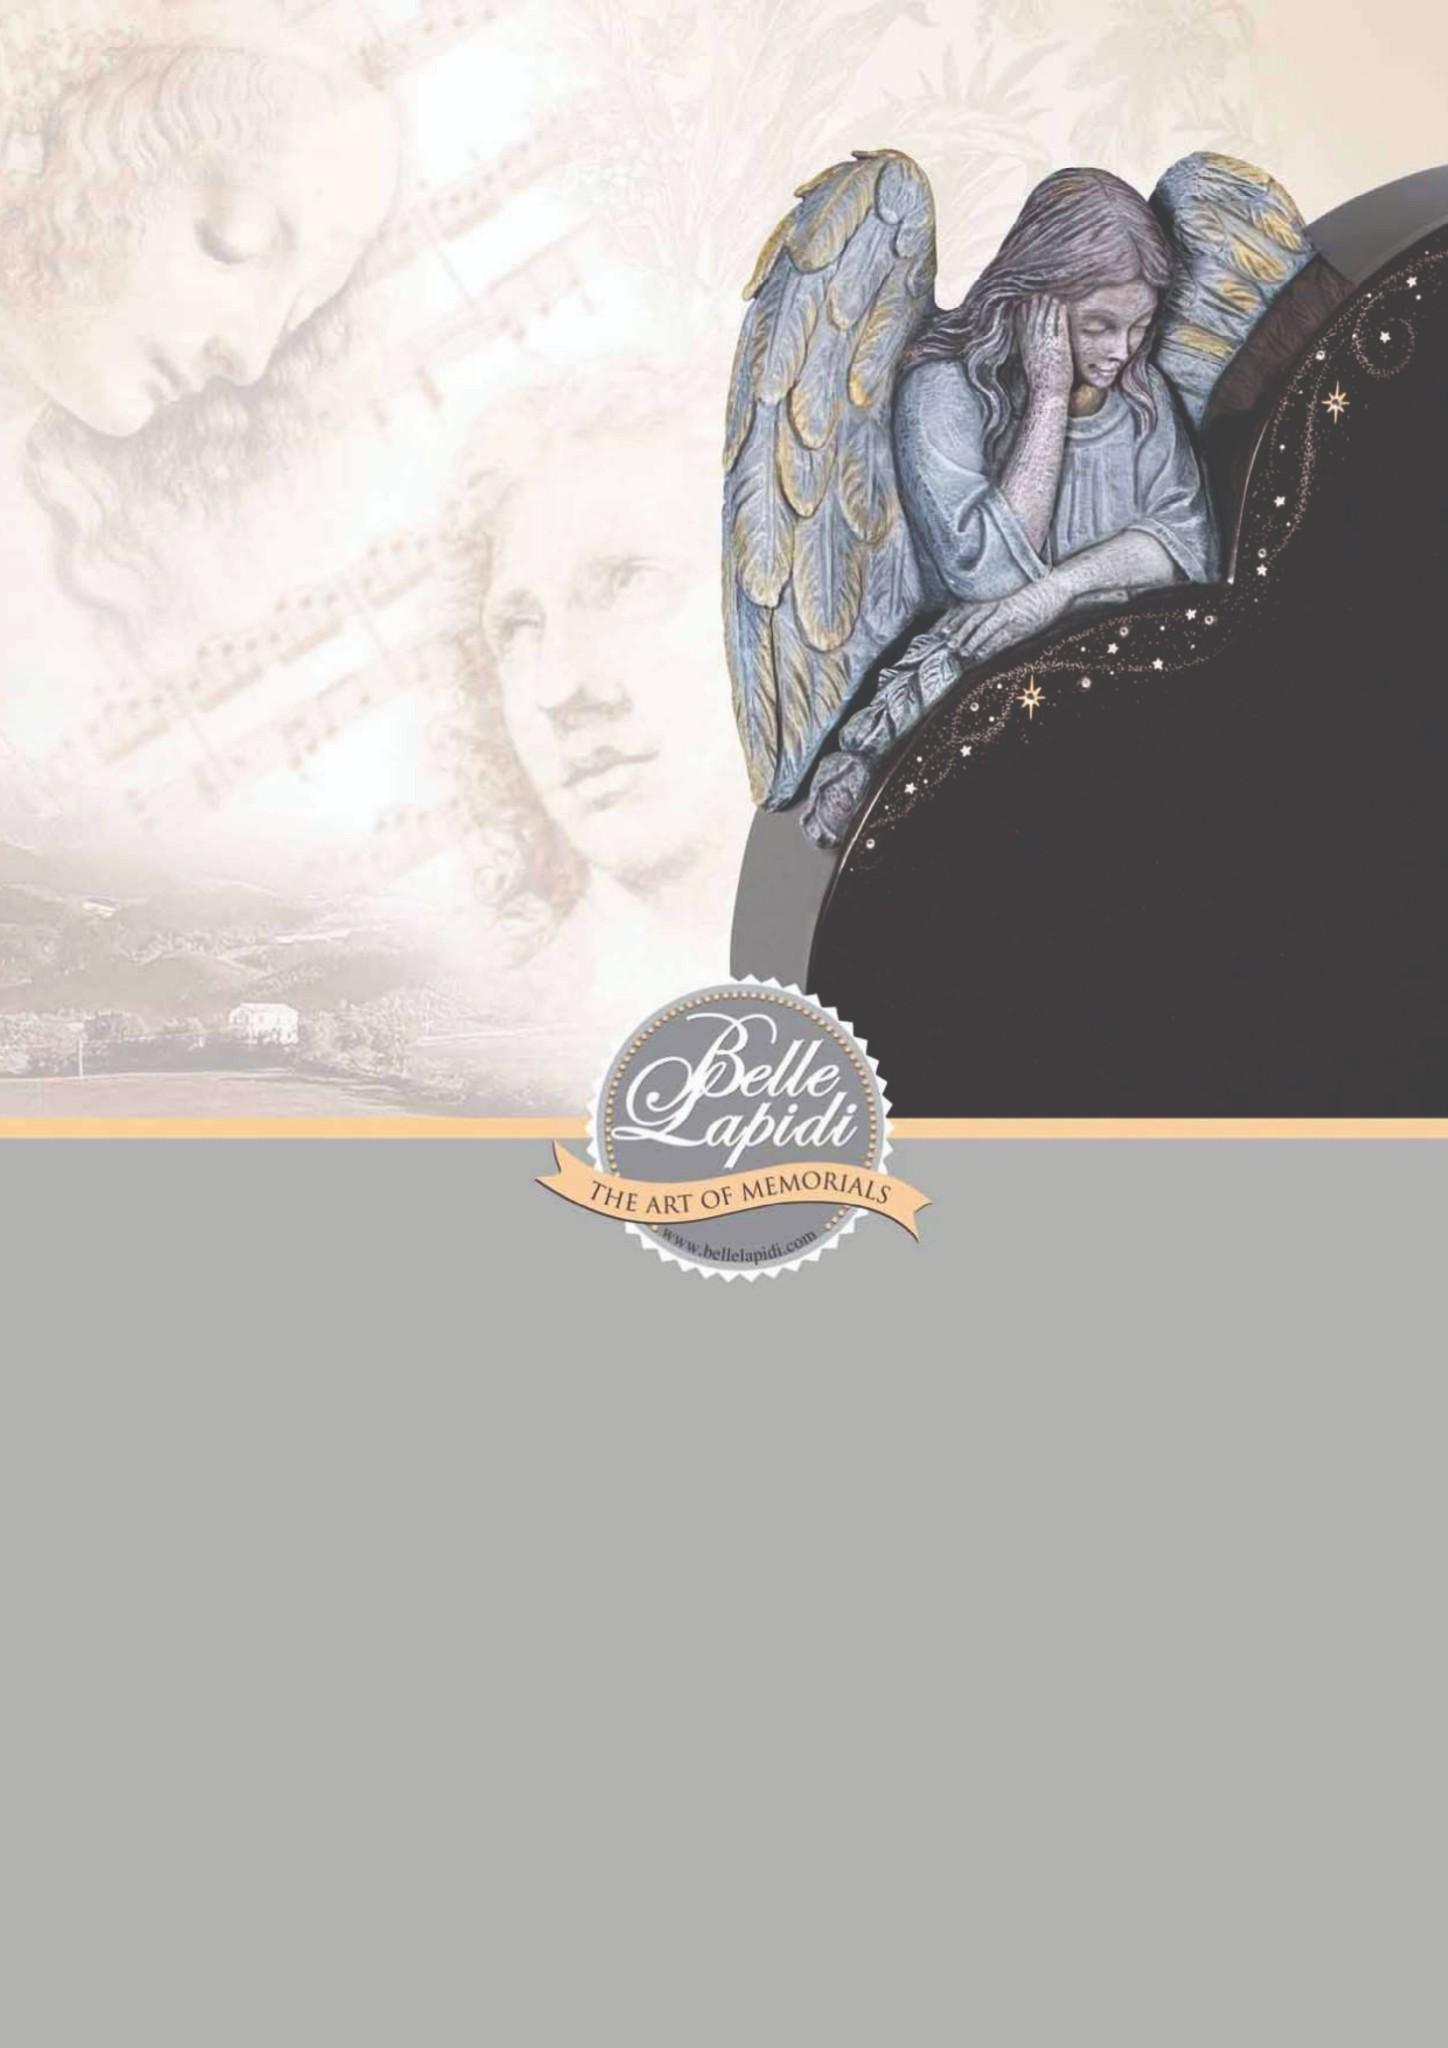 belle-lapidi-brochure-front-cover